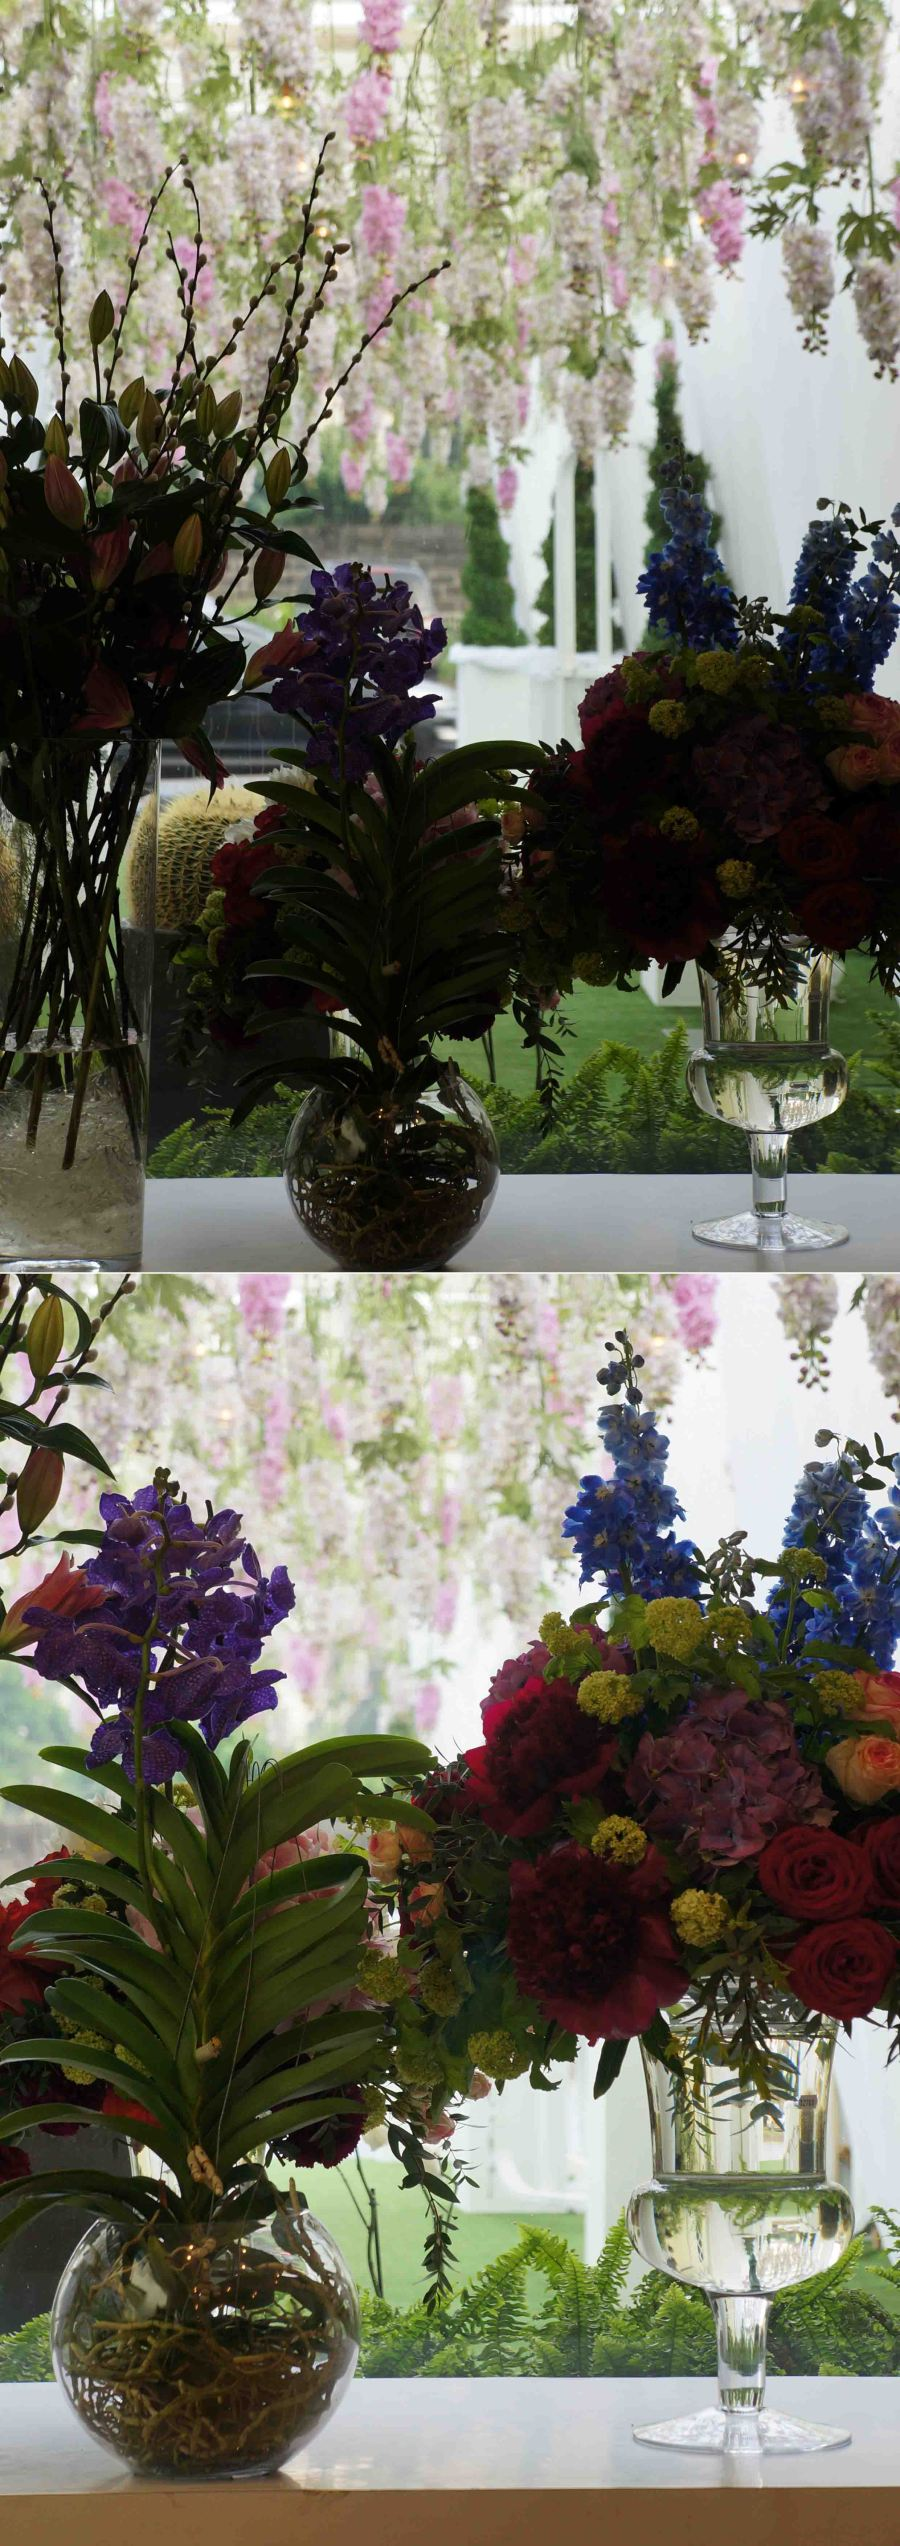 Apericena-Flowers7